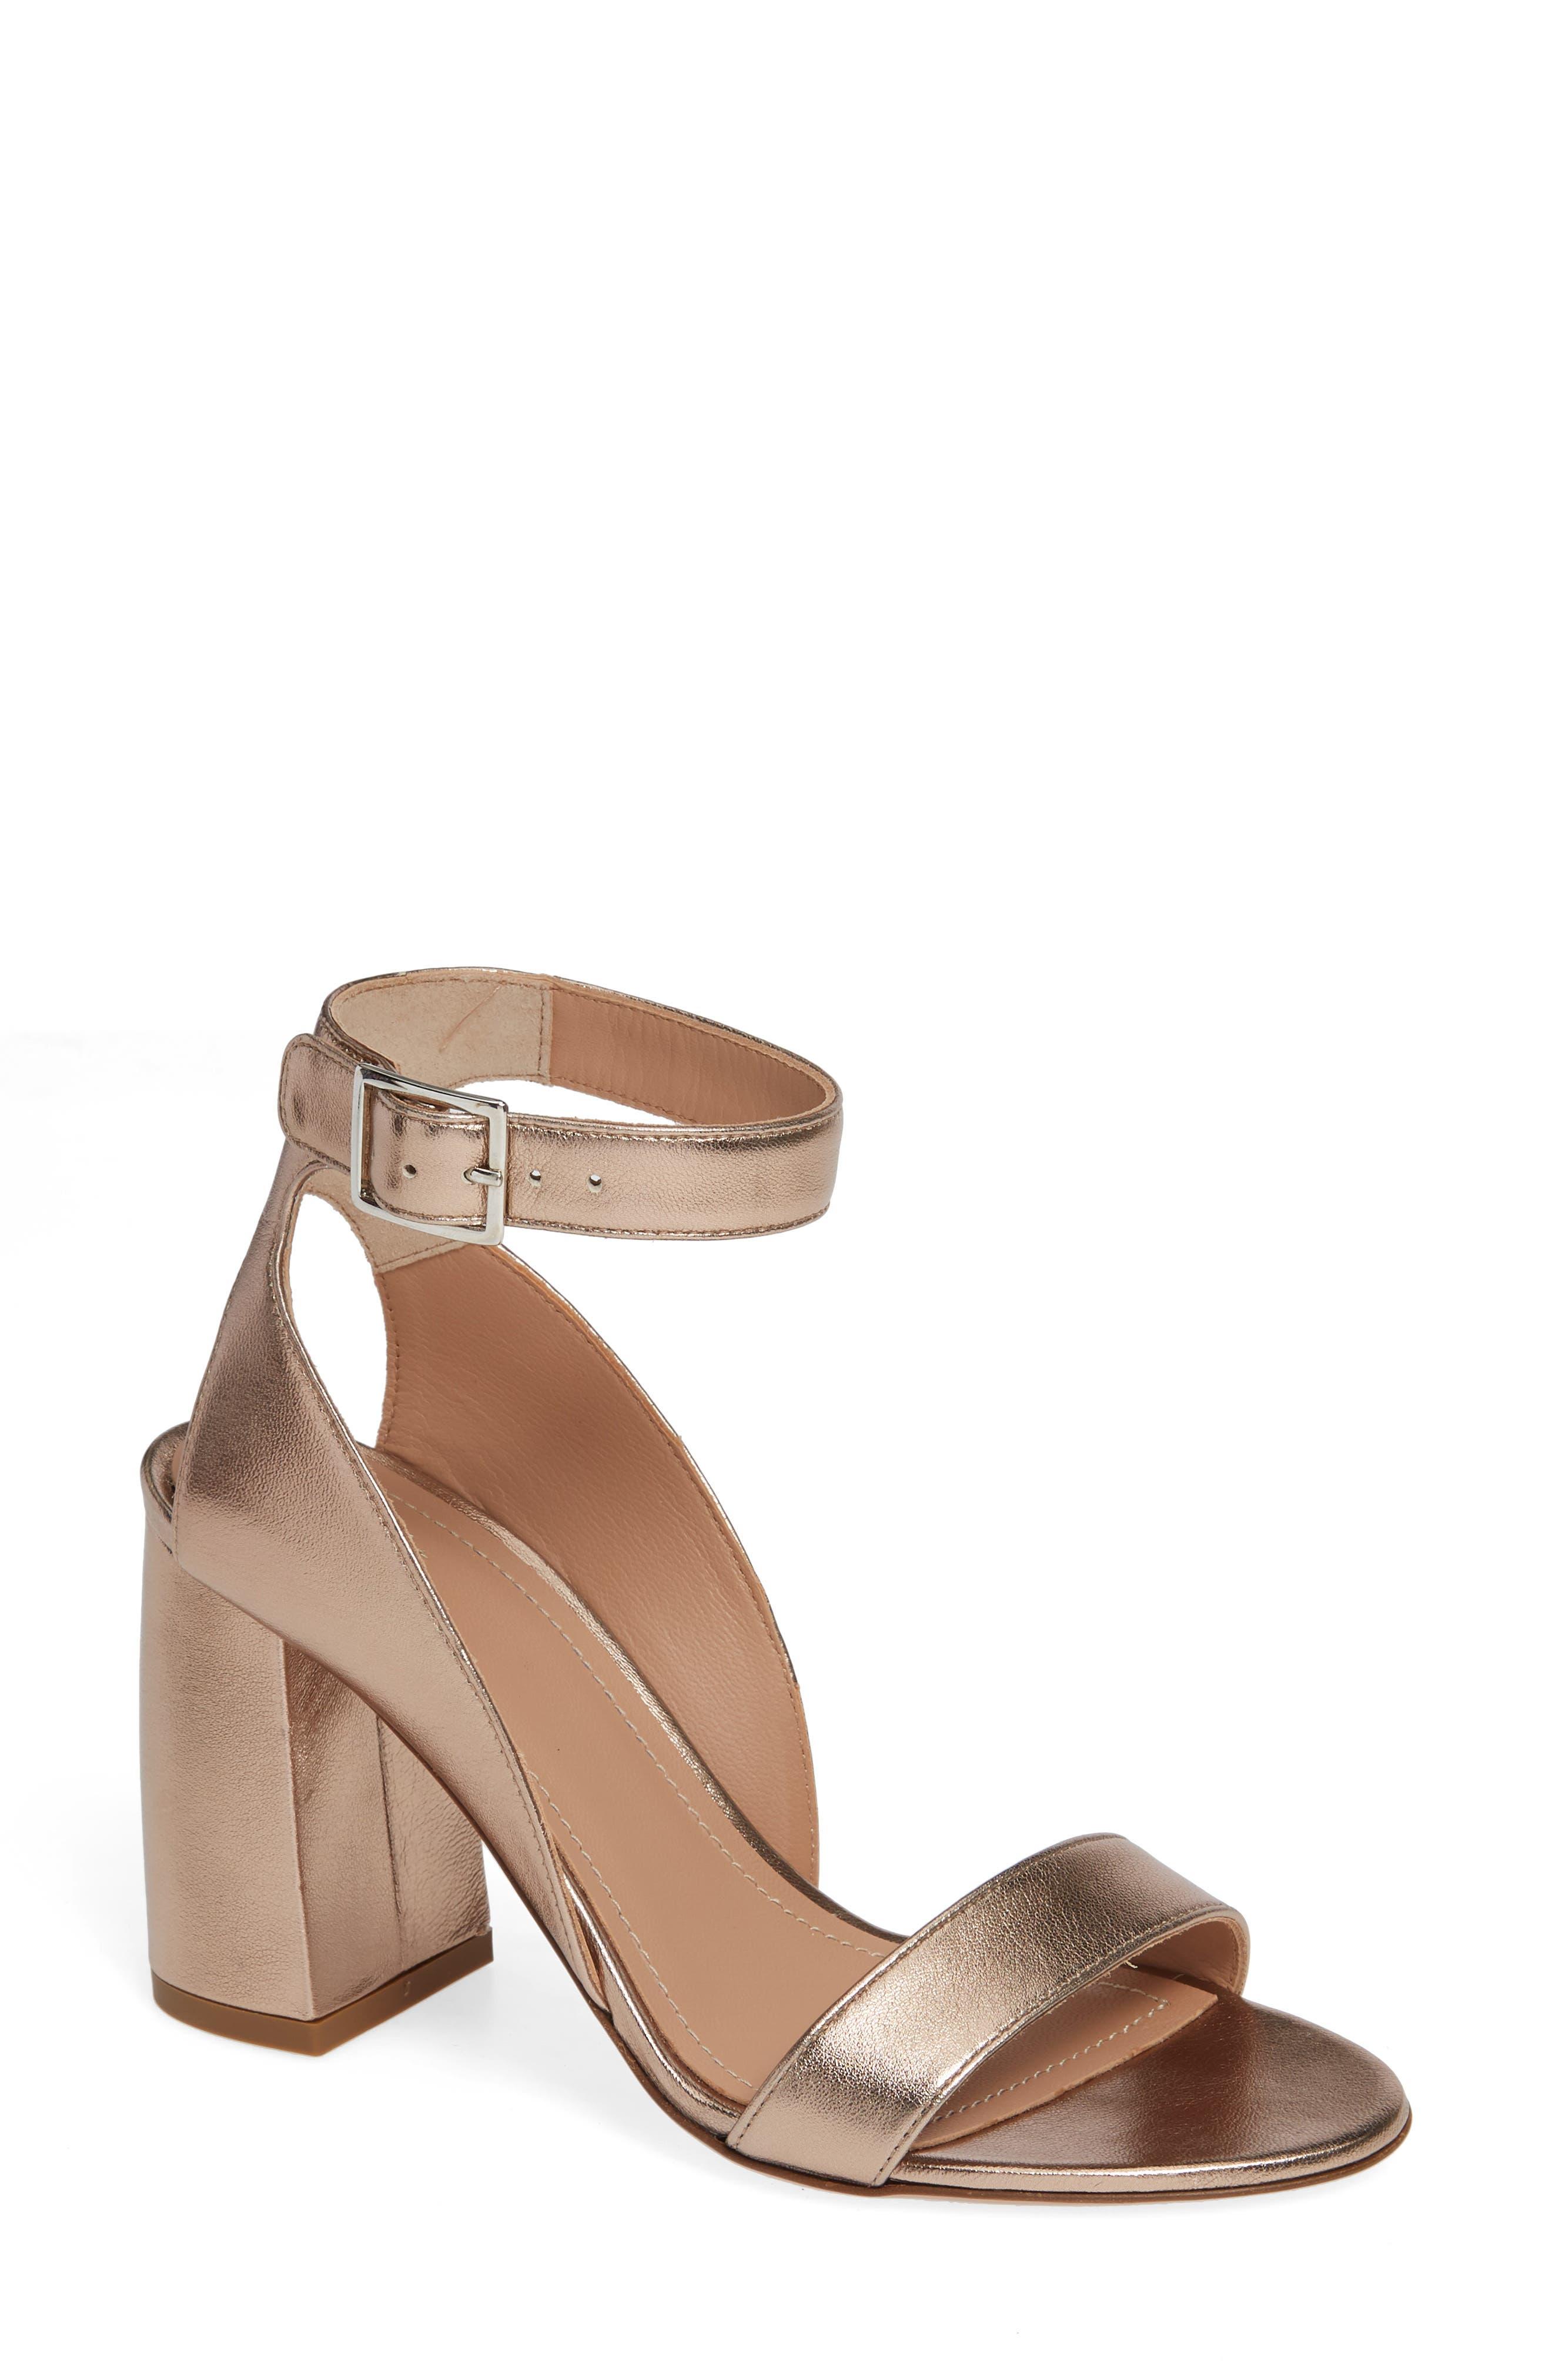 Guilia Block Heel Sandal,                             Main thumbnail 1, color,                             BRONZE LEATHER